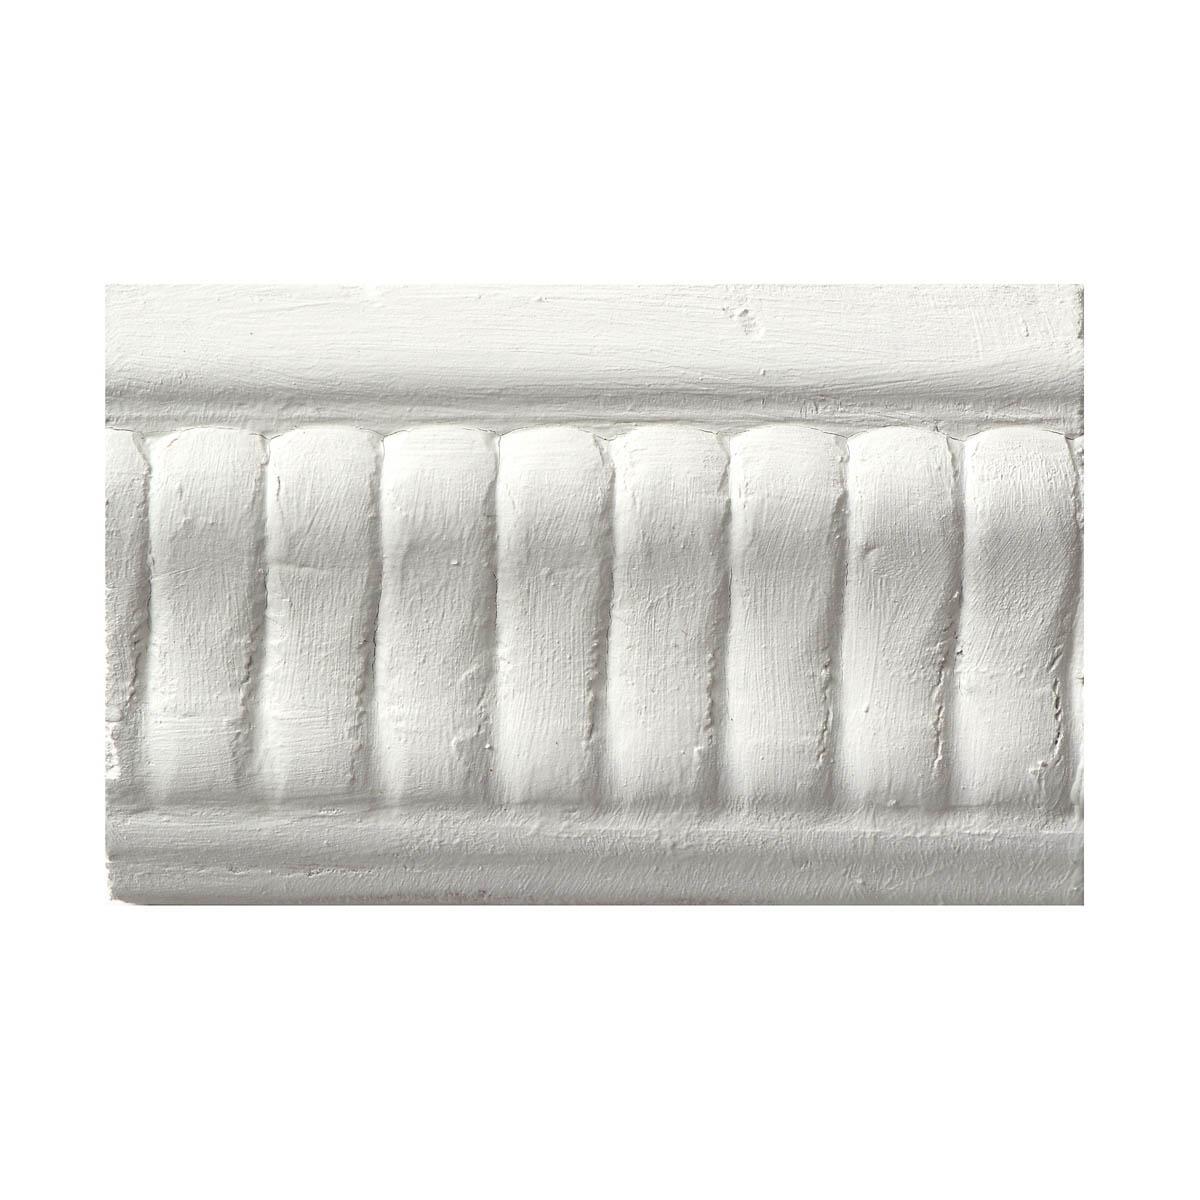 Waverly ® Inspirations Chalk Acrylic Paint - White, 8 oz.